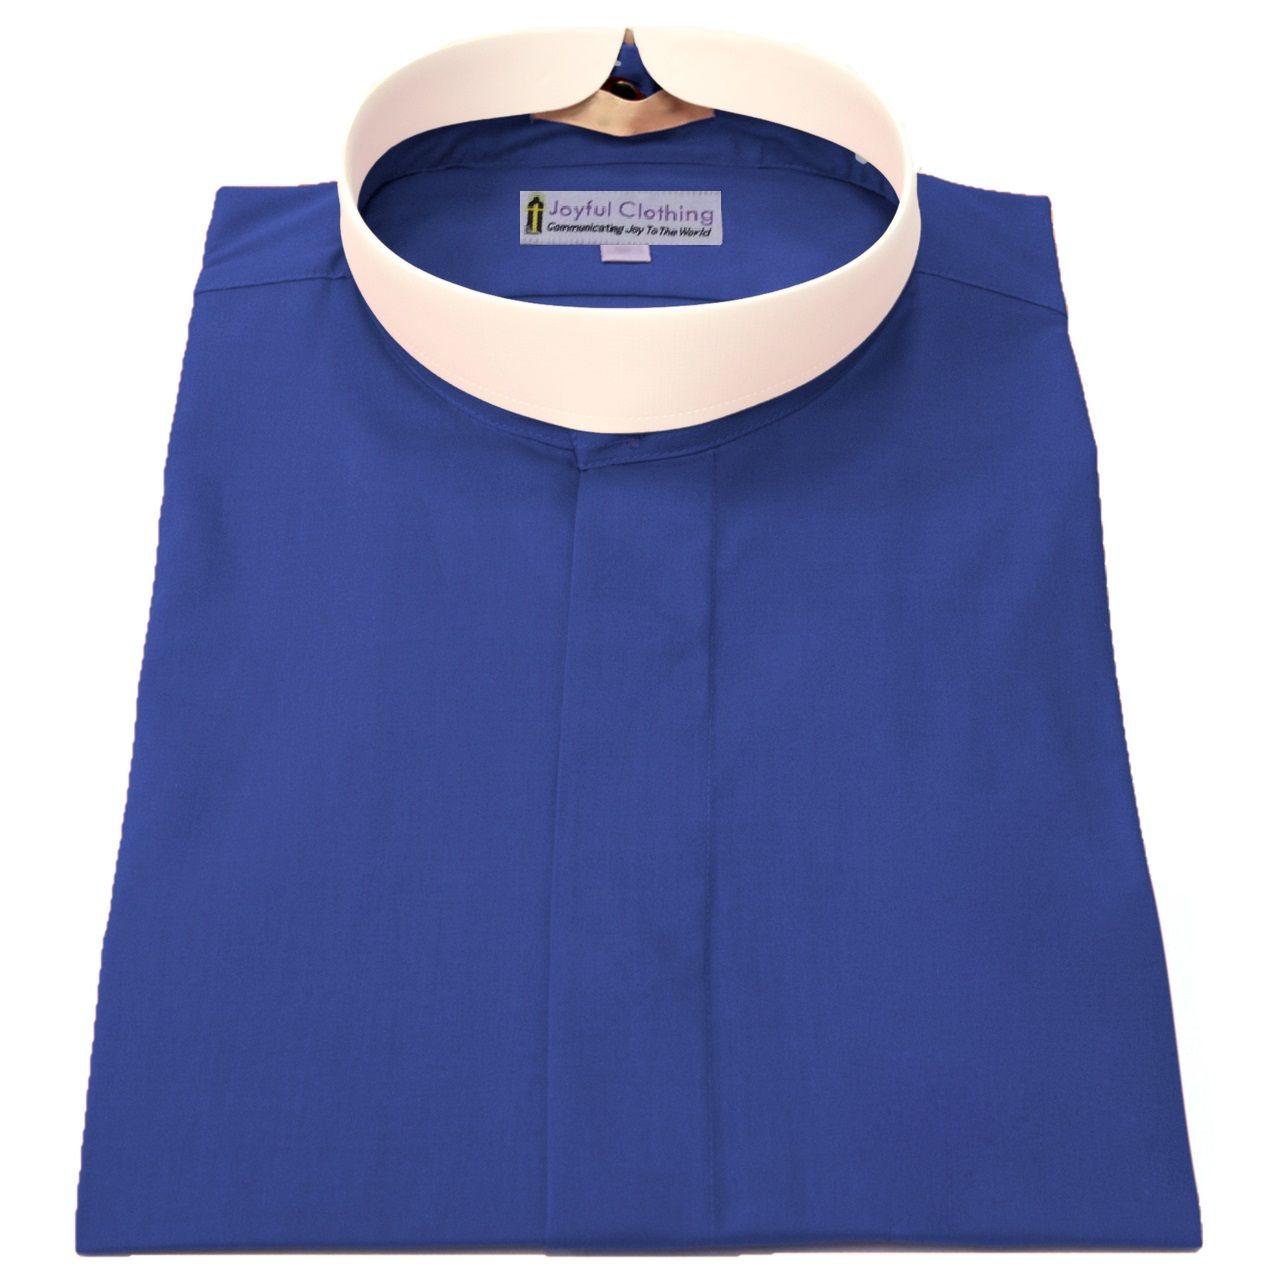 671. Women's Short-Sleeve (Banded) Full-Collar Clergy Shirt - Royal Blue